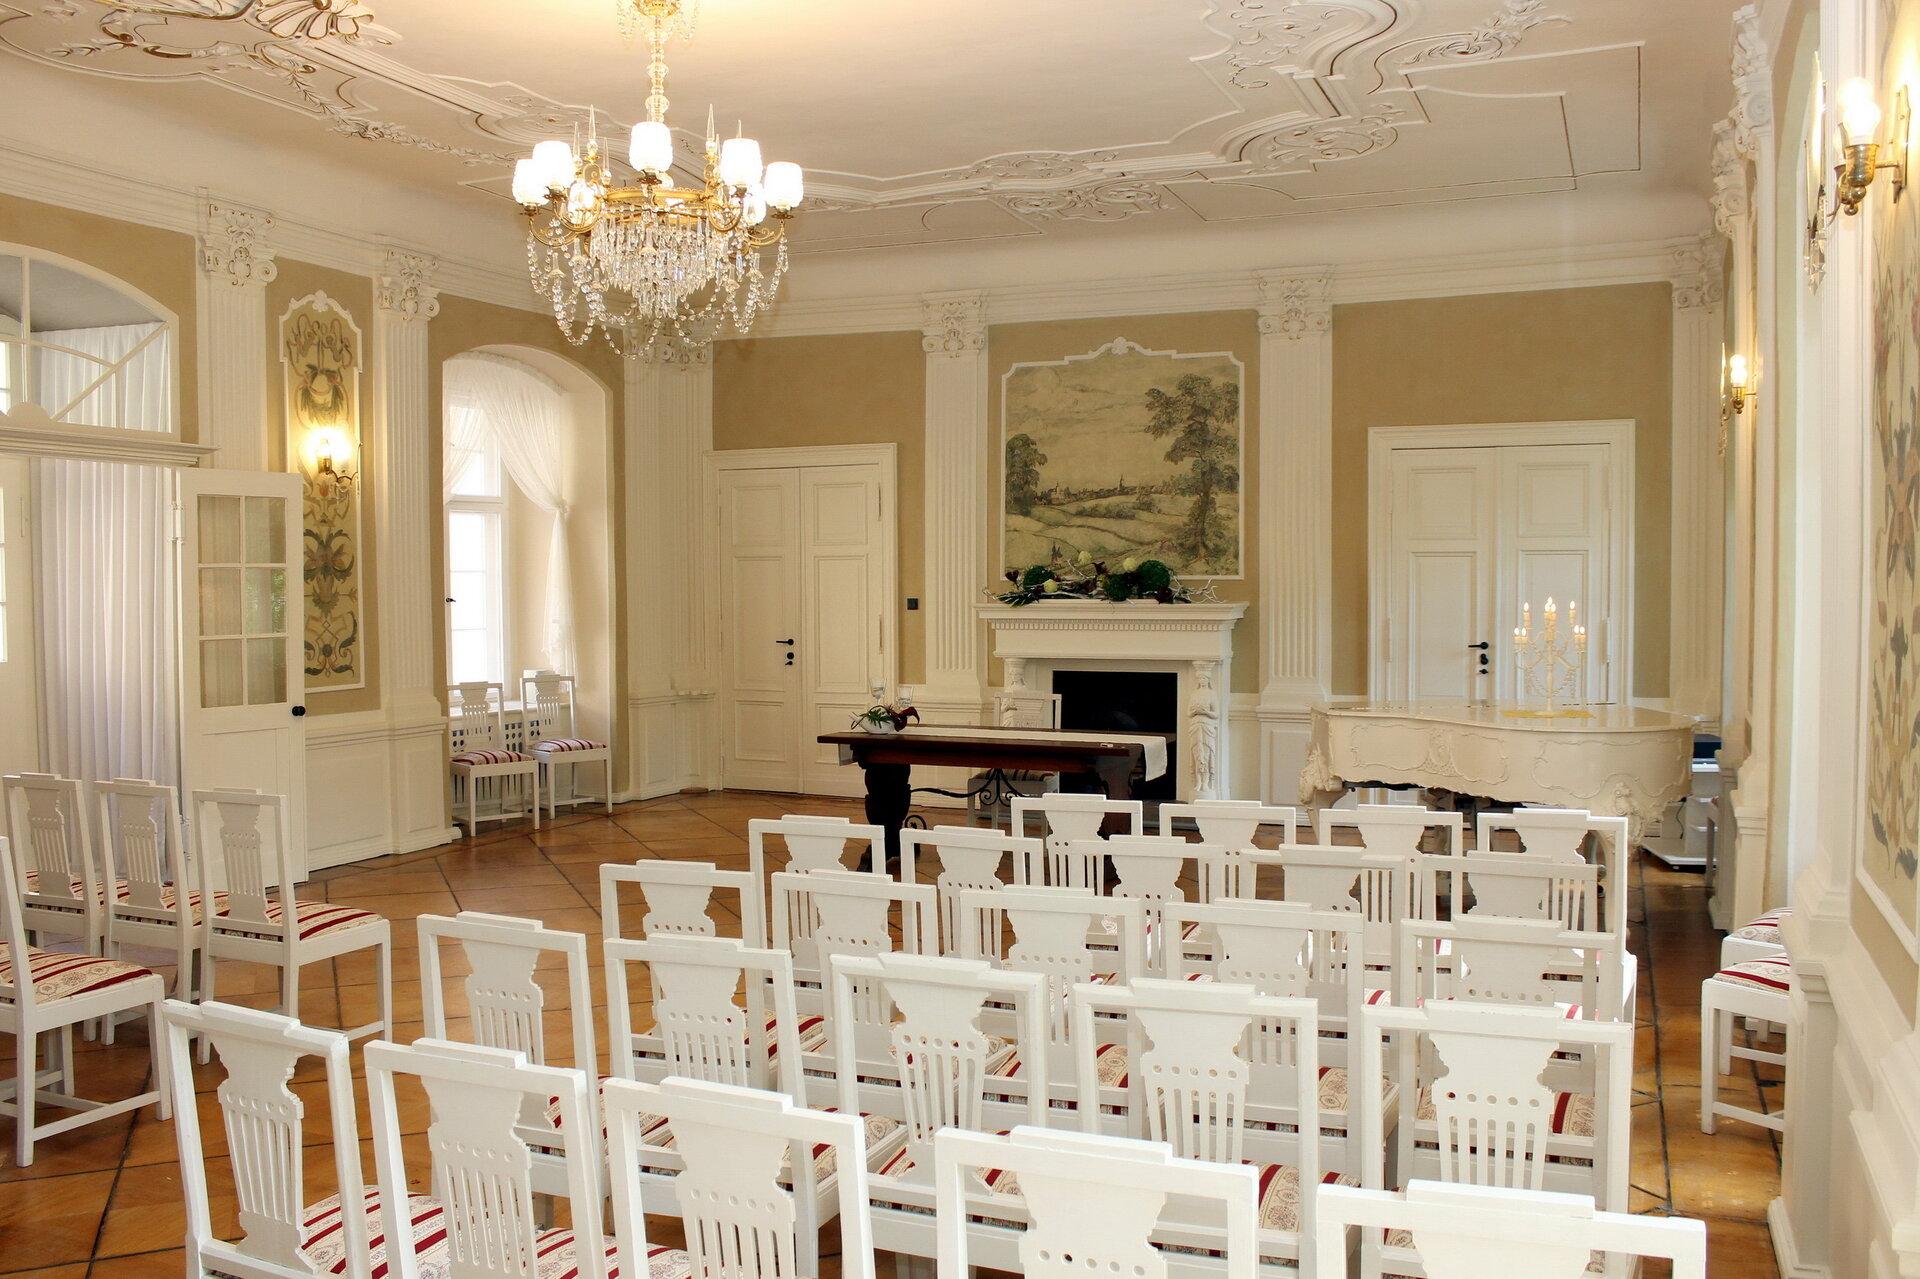 Rittersaal im Stadtschloss Vetschau/Spreewald, Quelle: Stadt Vetschau/Spreewald